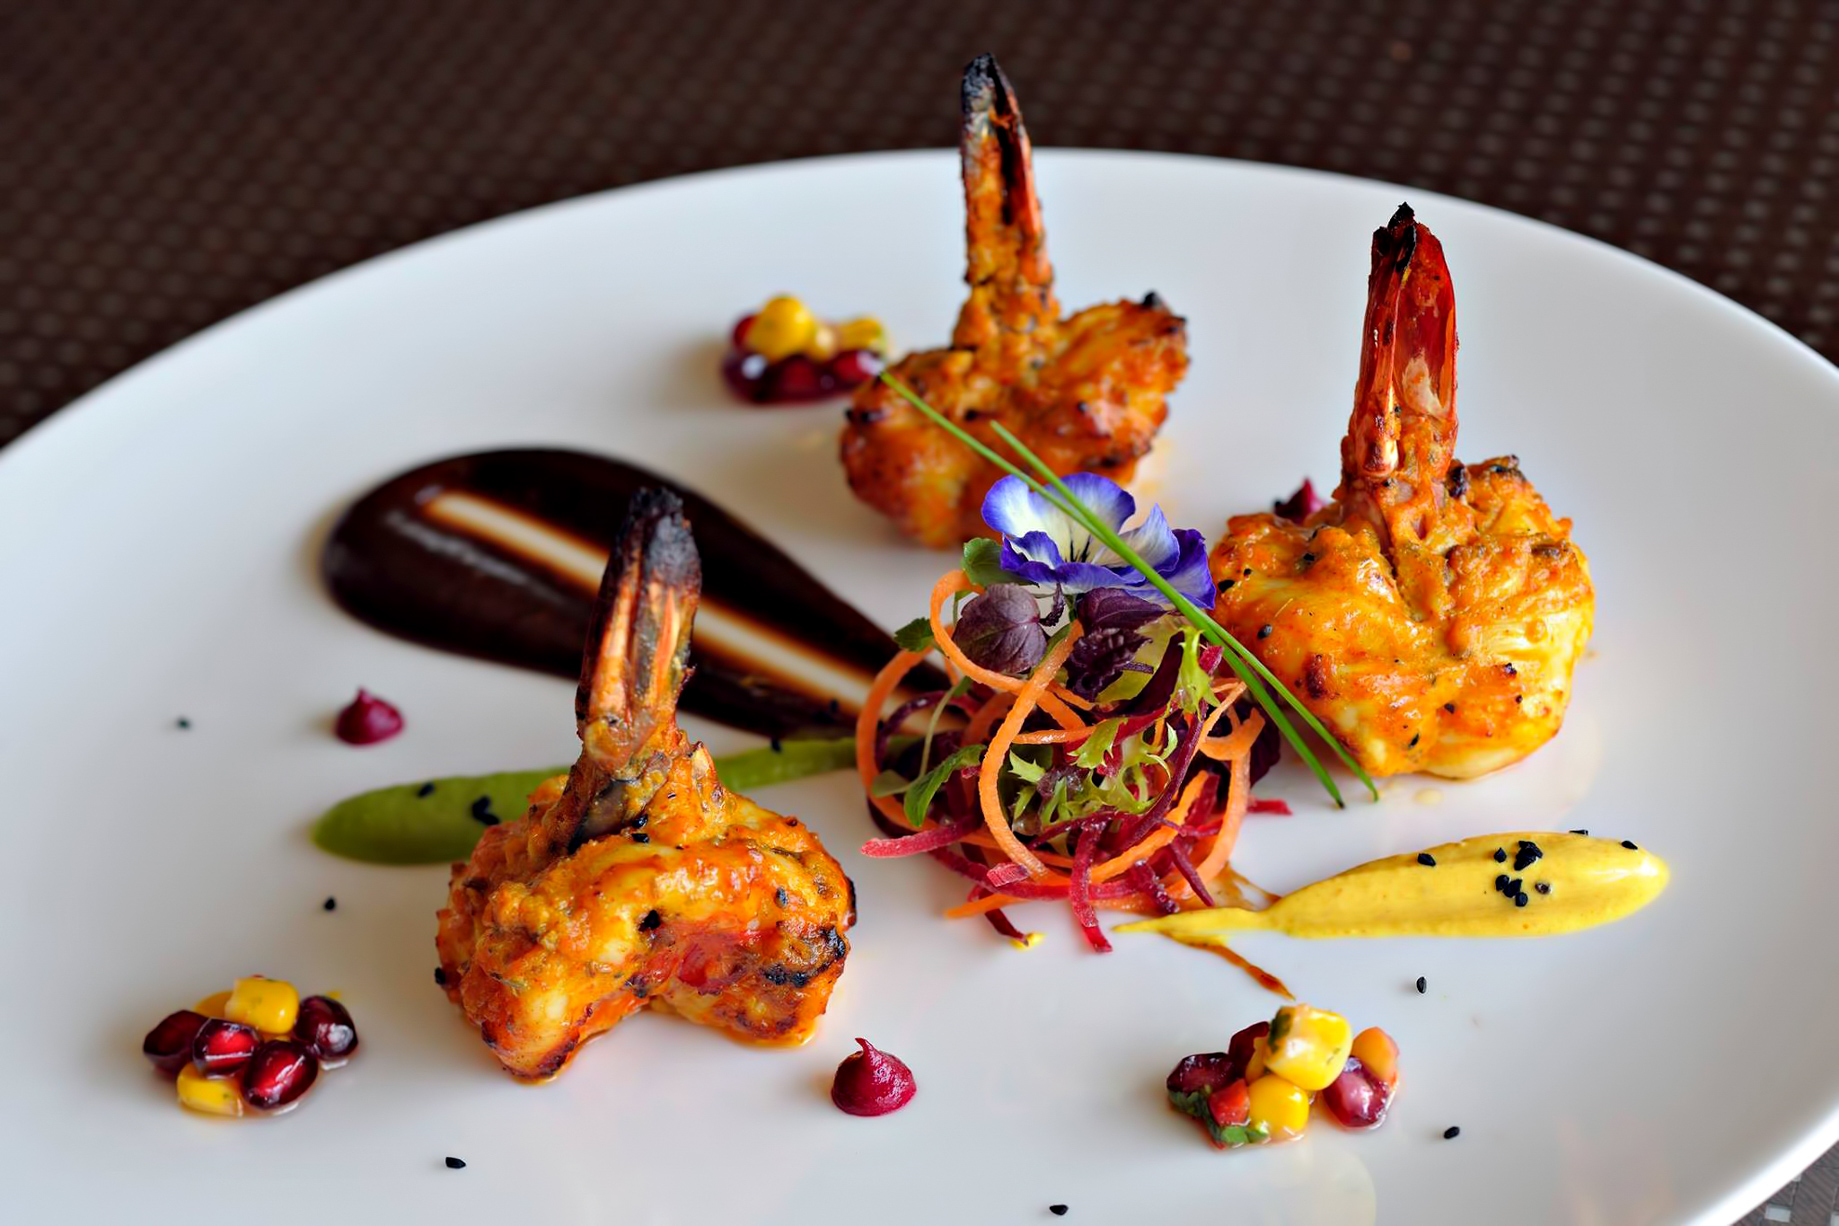 Armani Hotel Dubai – Burj Khalifa, Dubaï, Émirats arabes unis – Armani Amal art culinaire exquis